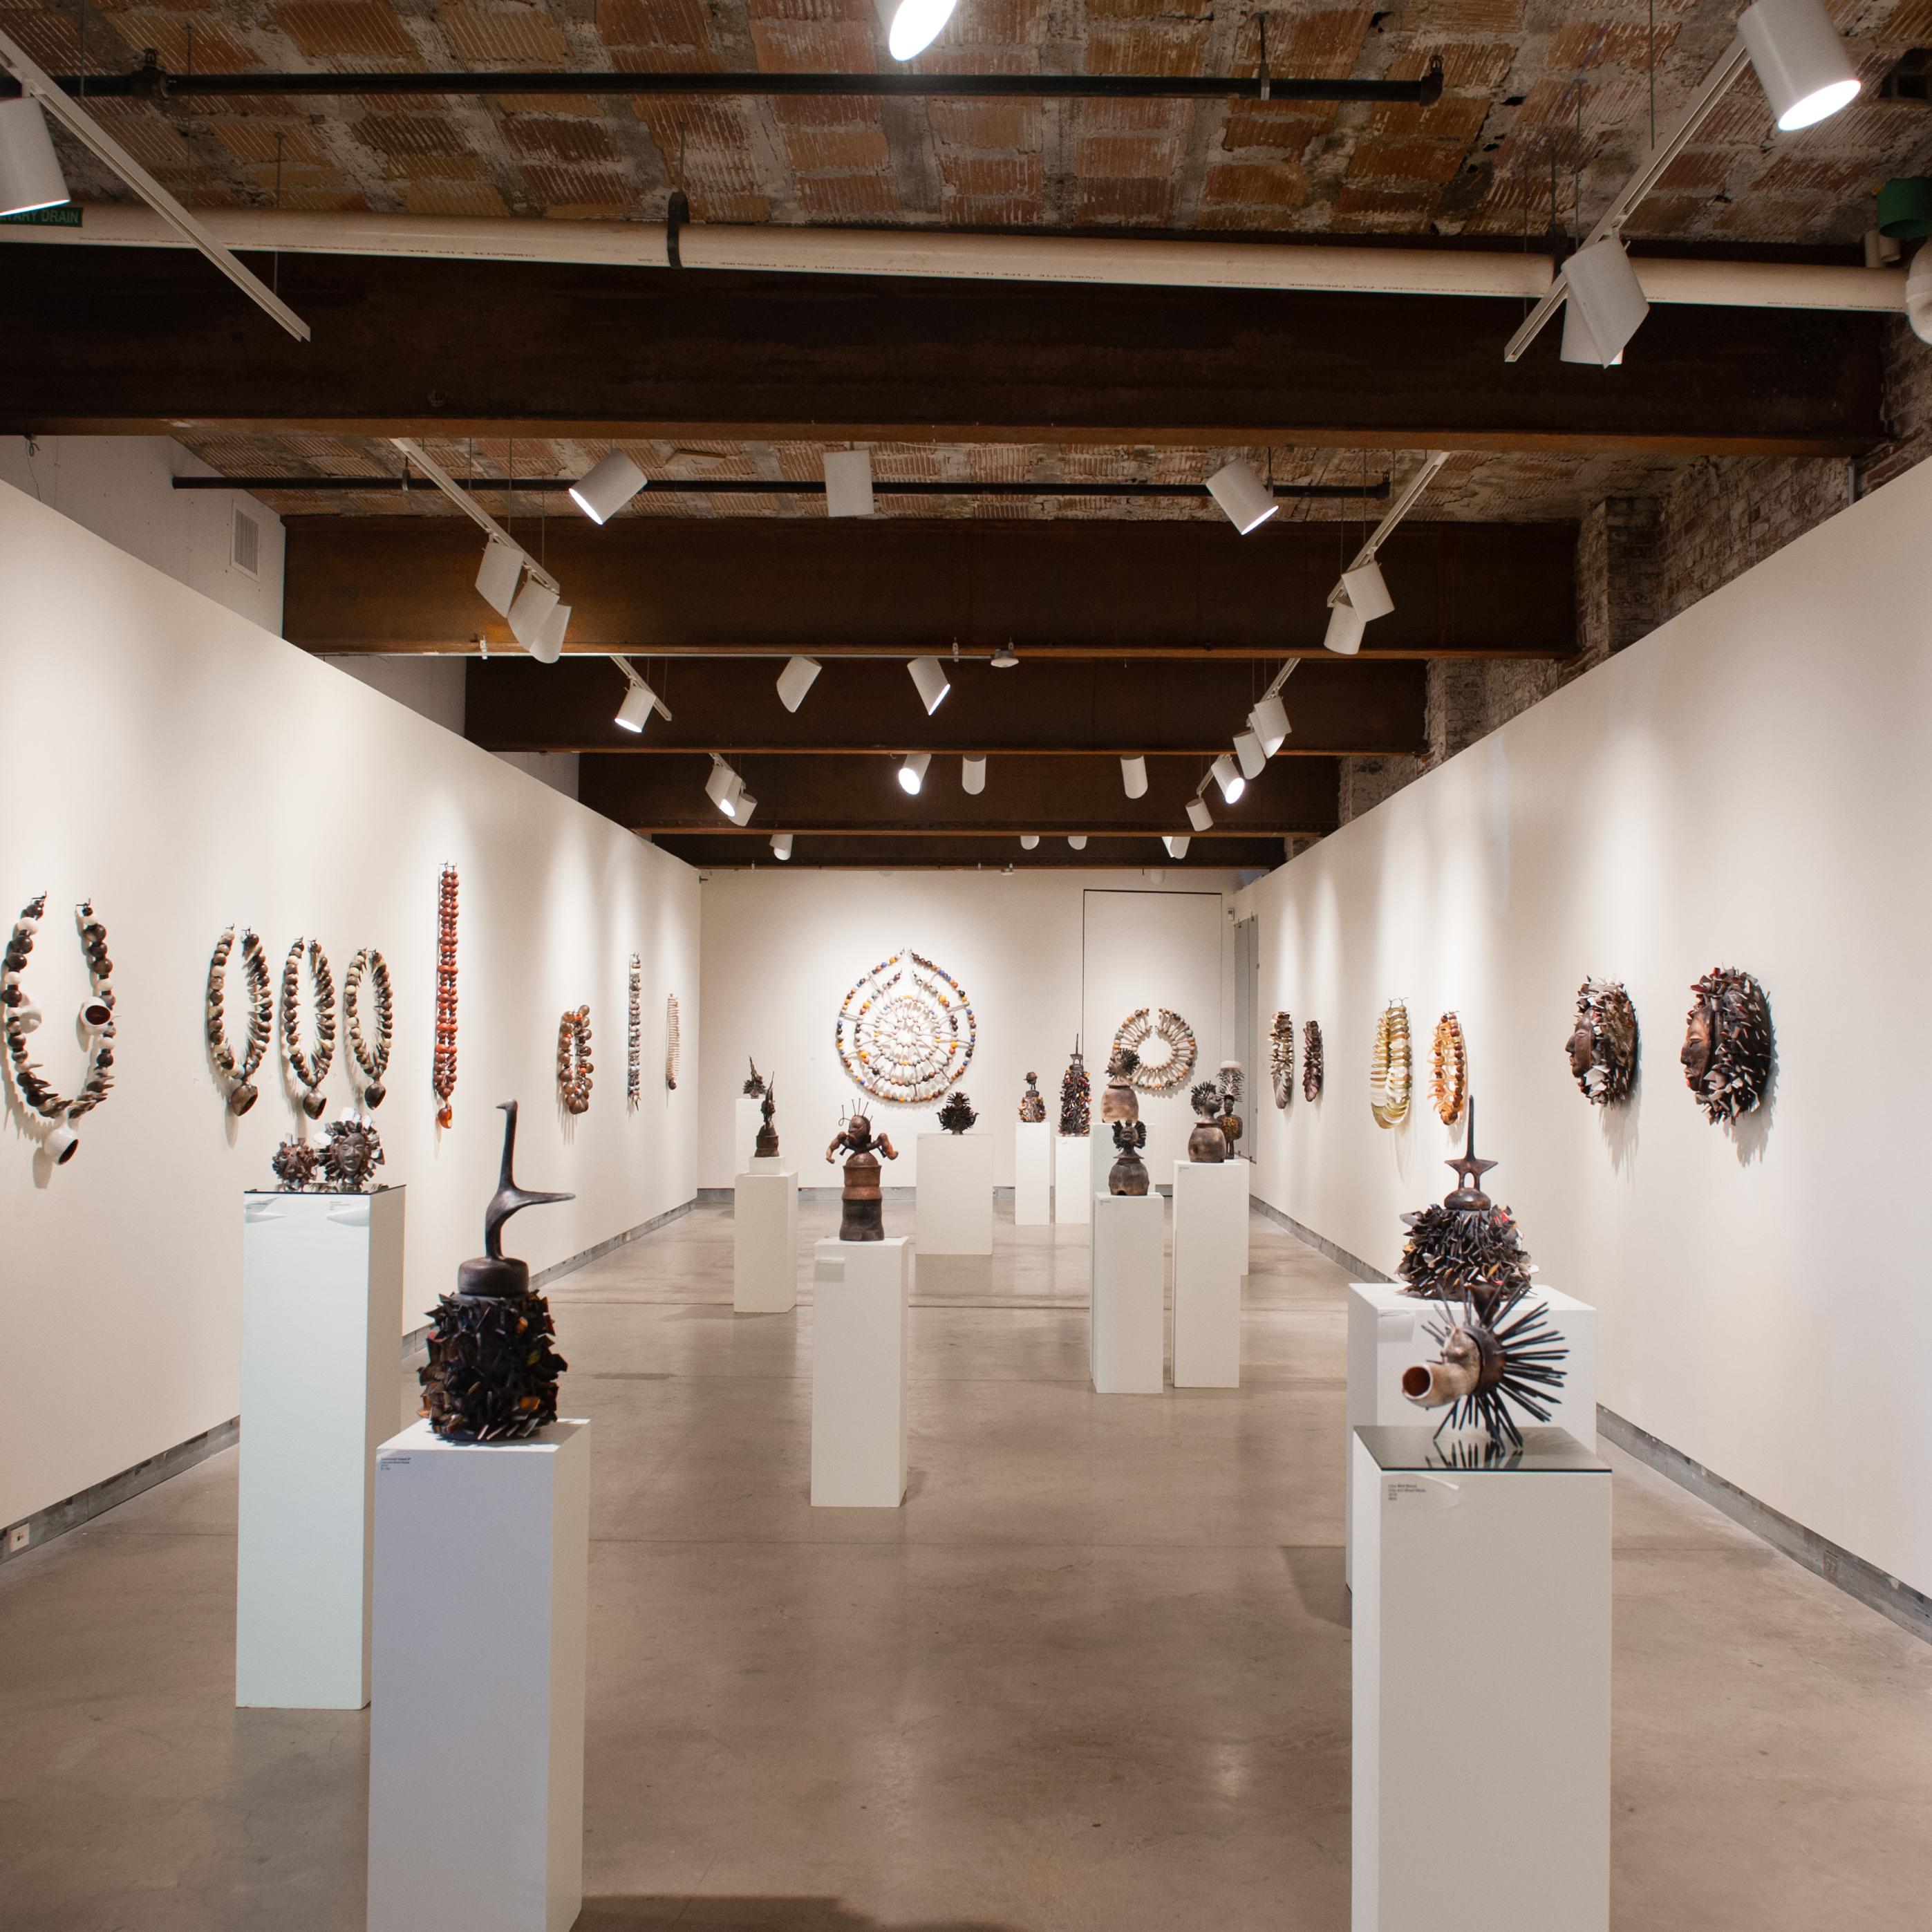 Sharif Bey Exhibition